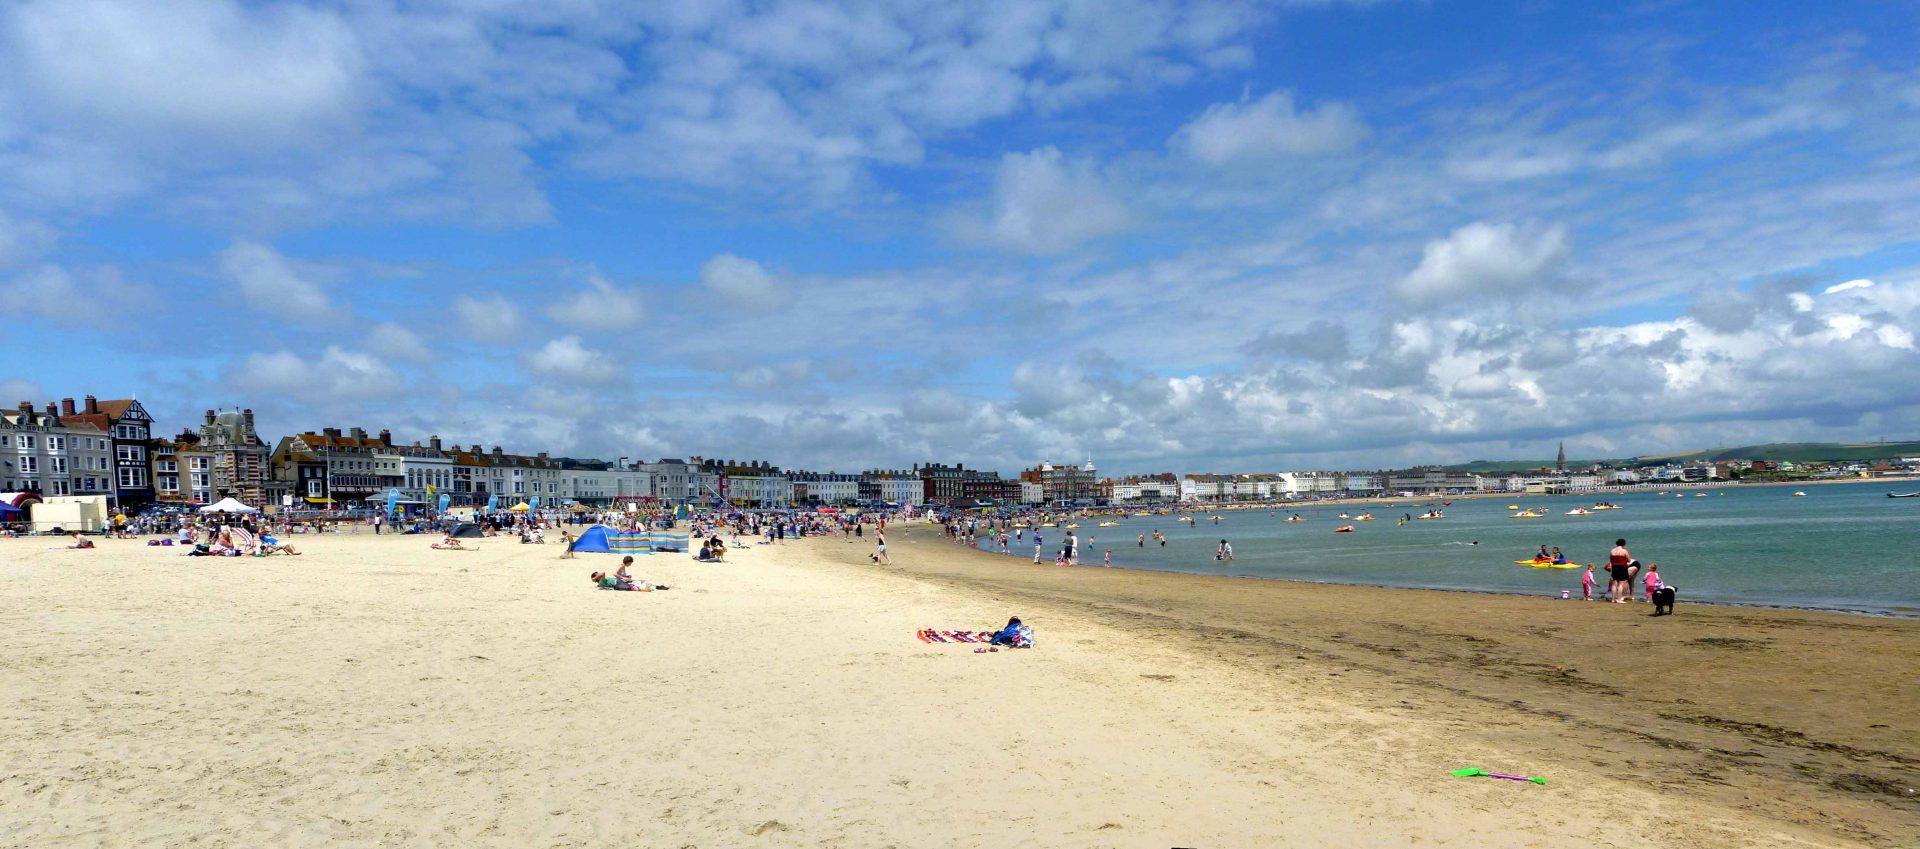 A panoramic photo of Weymouth beach